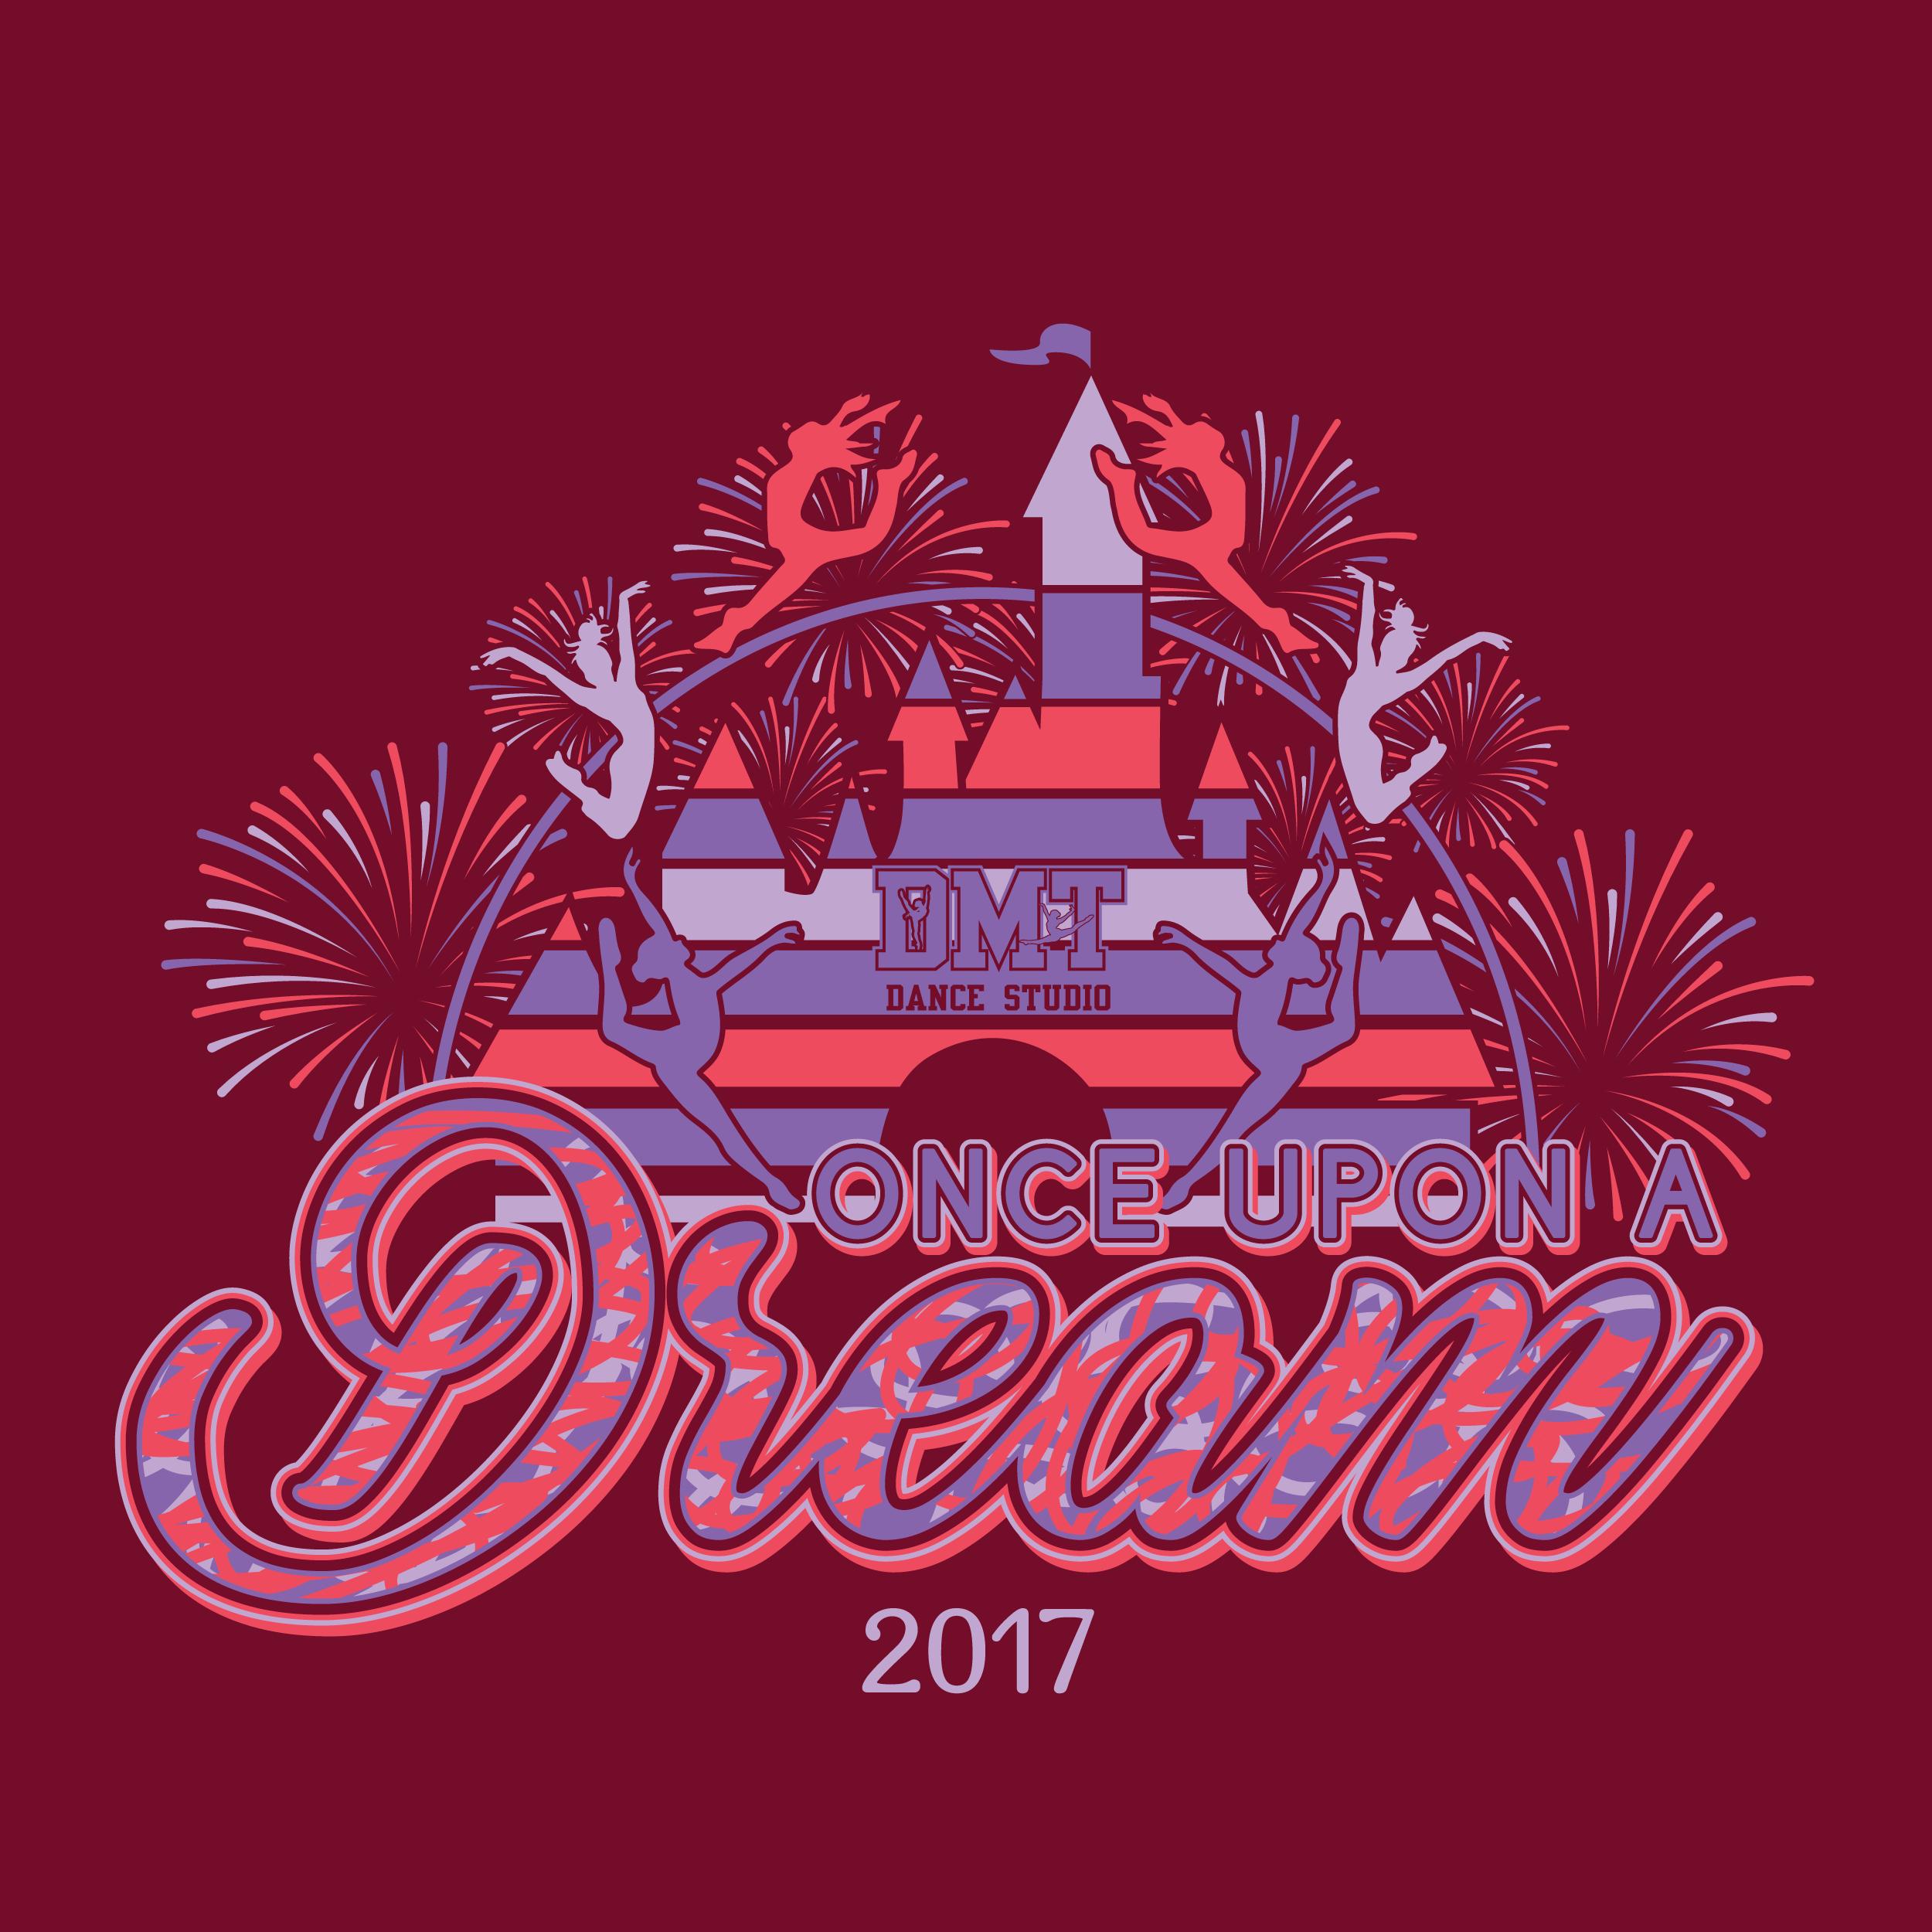 portfolio_dmt_2017_onceuponadream-01.png